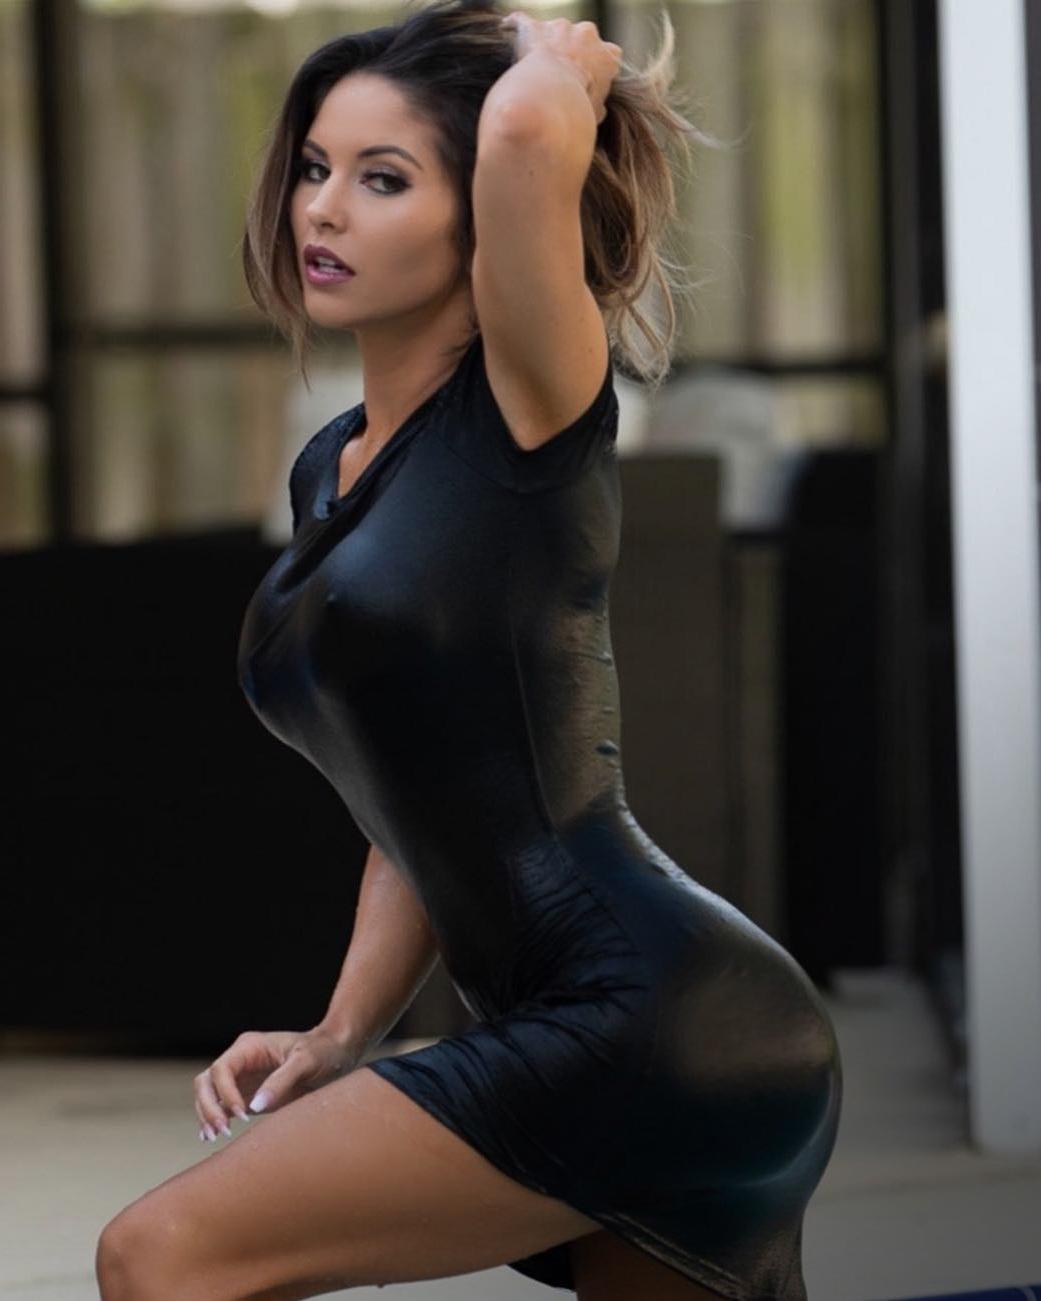 Hot Top Model Nude Video Gif